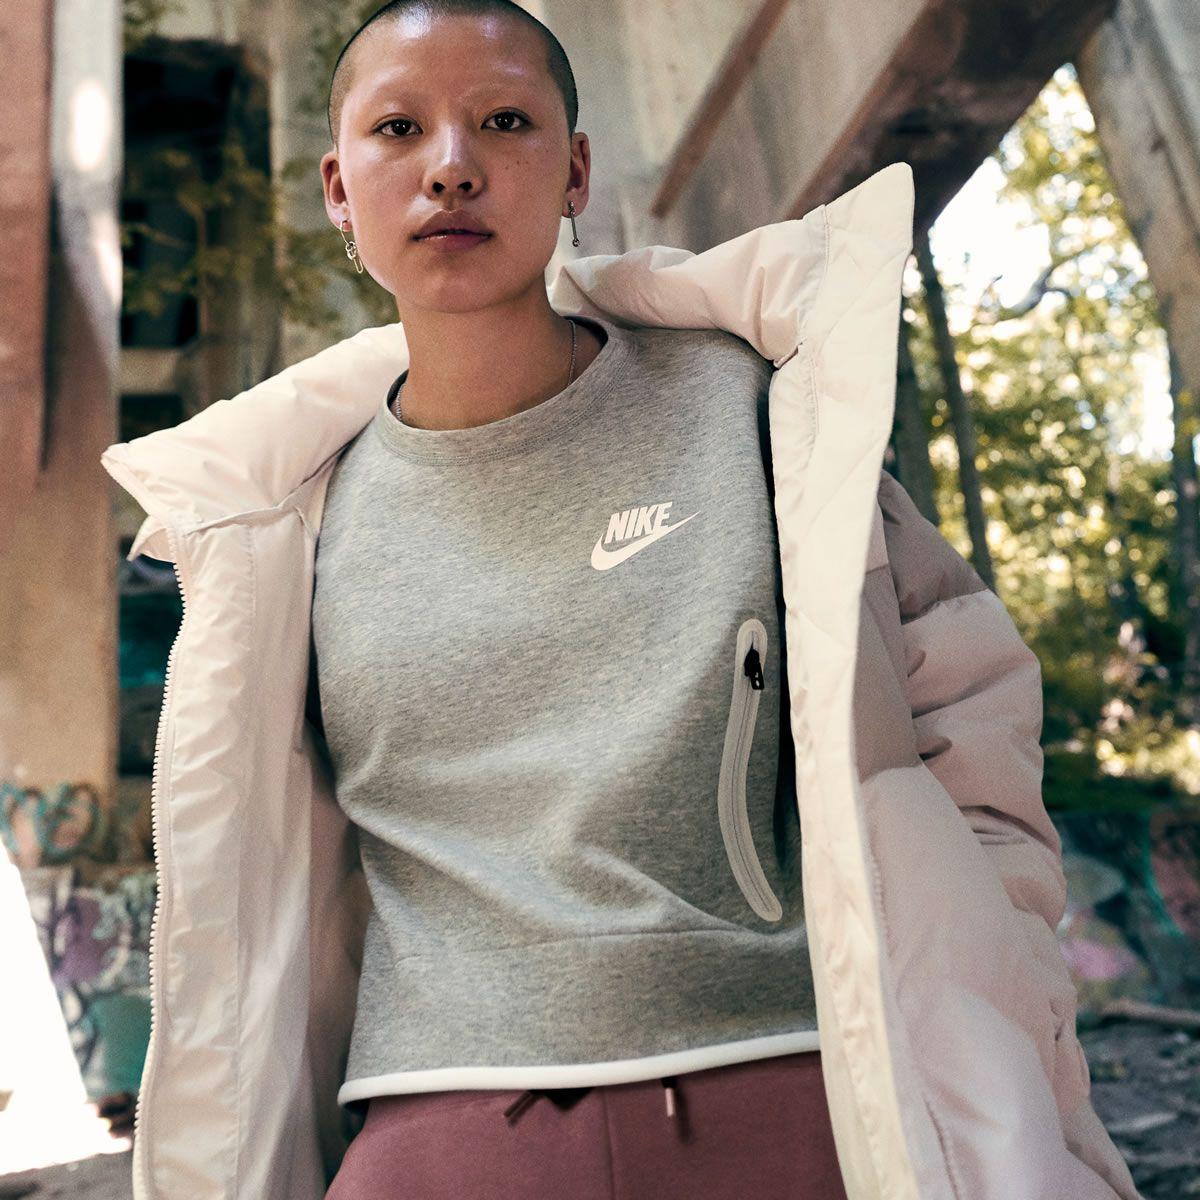 e794e38b50d0 Nike Clothing for Women 2019 - Macy s